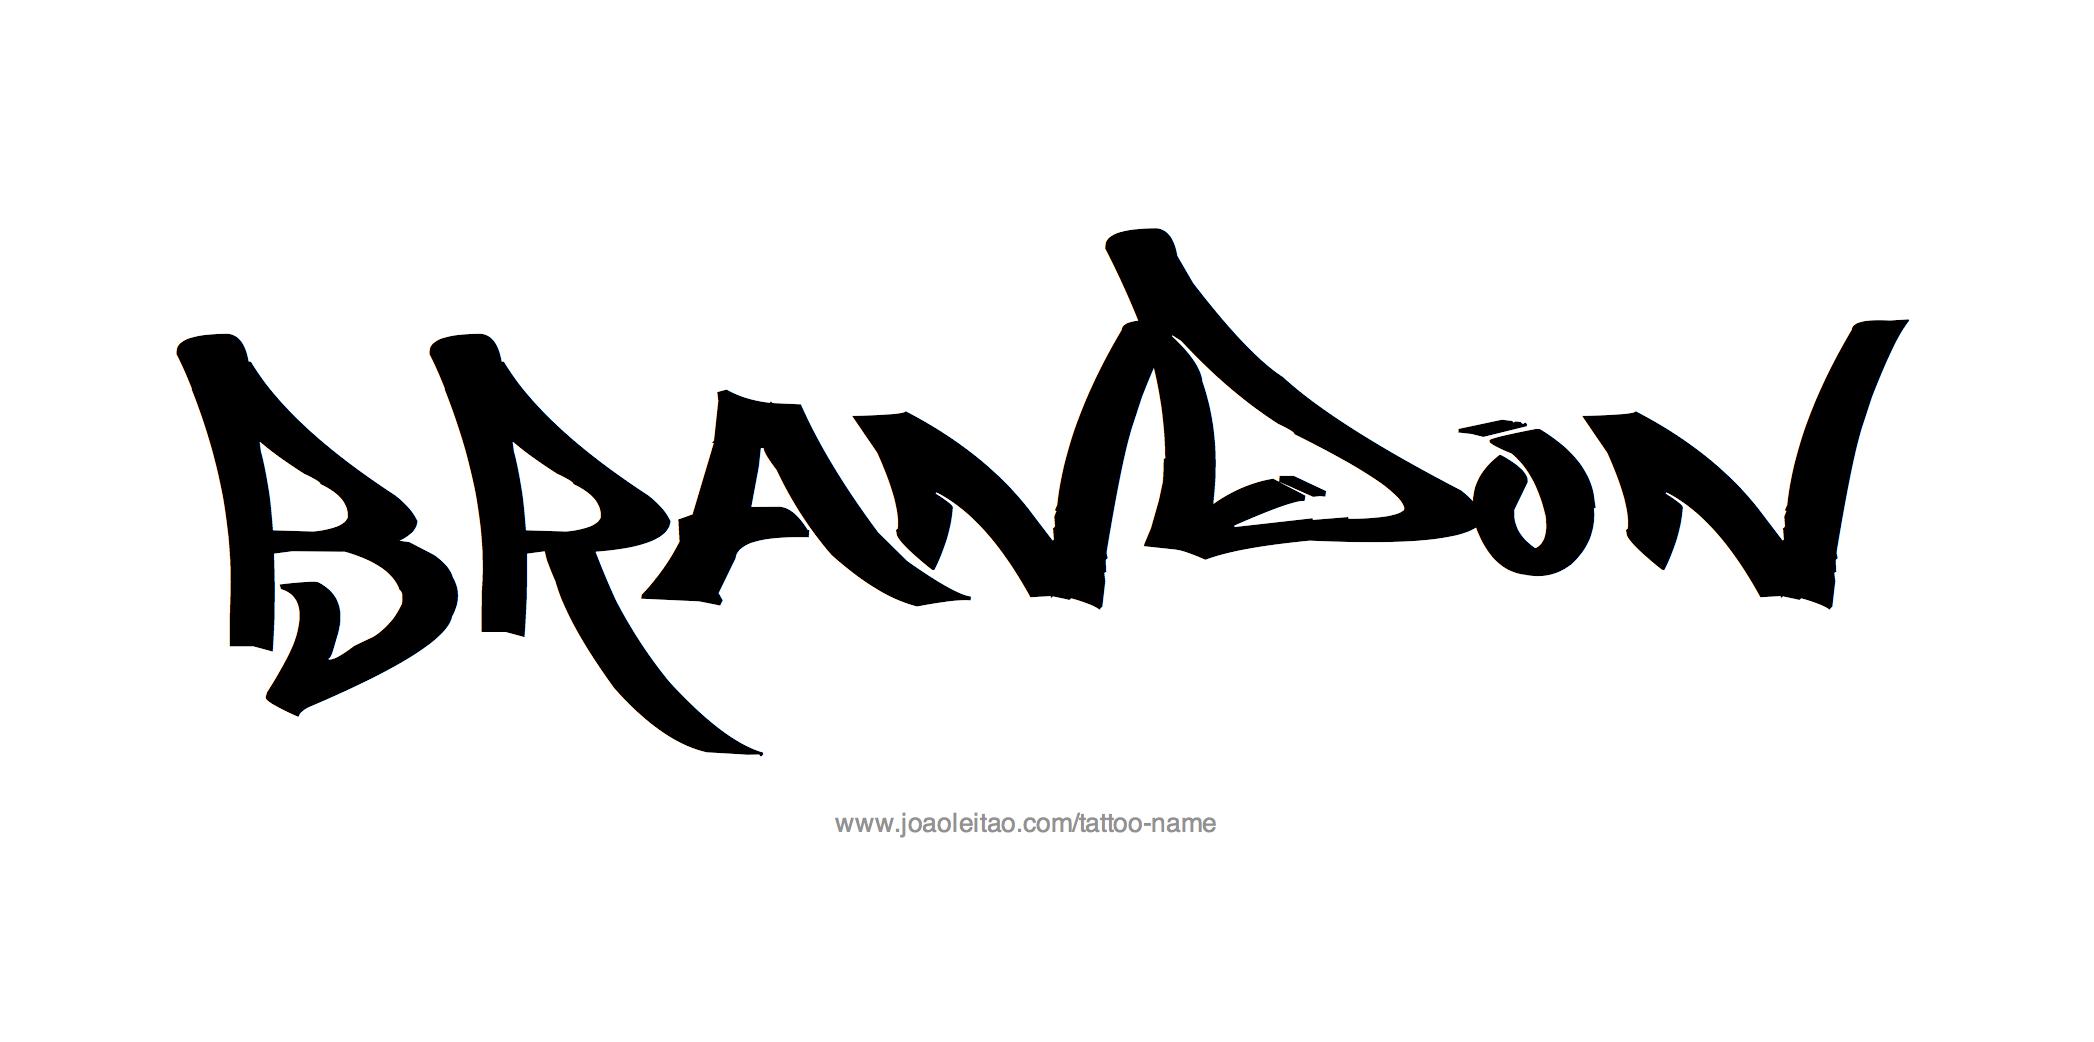 brandon name tattoo designs. Black Bedroom Furniture Sets. Home Design Ideas